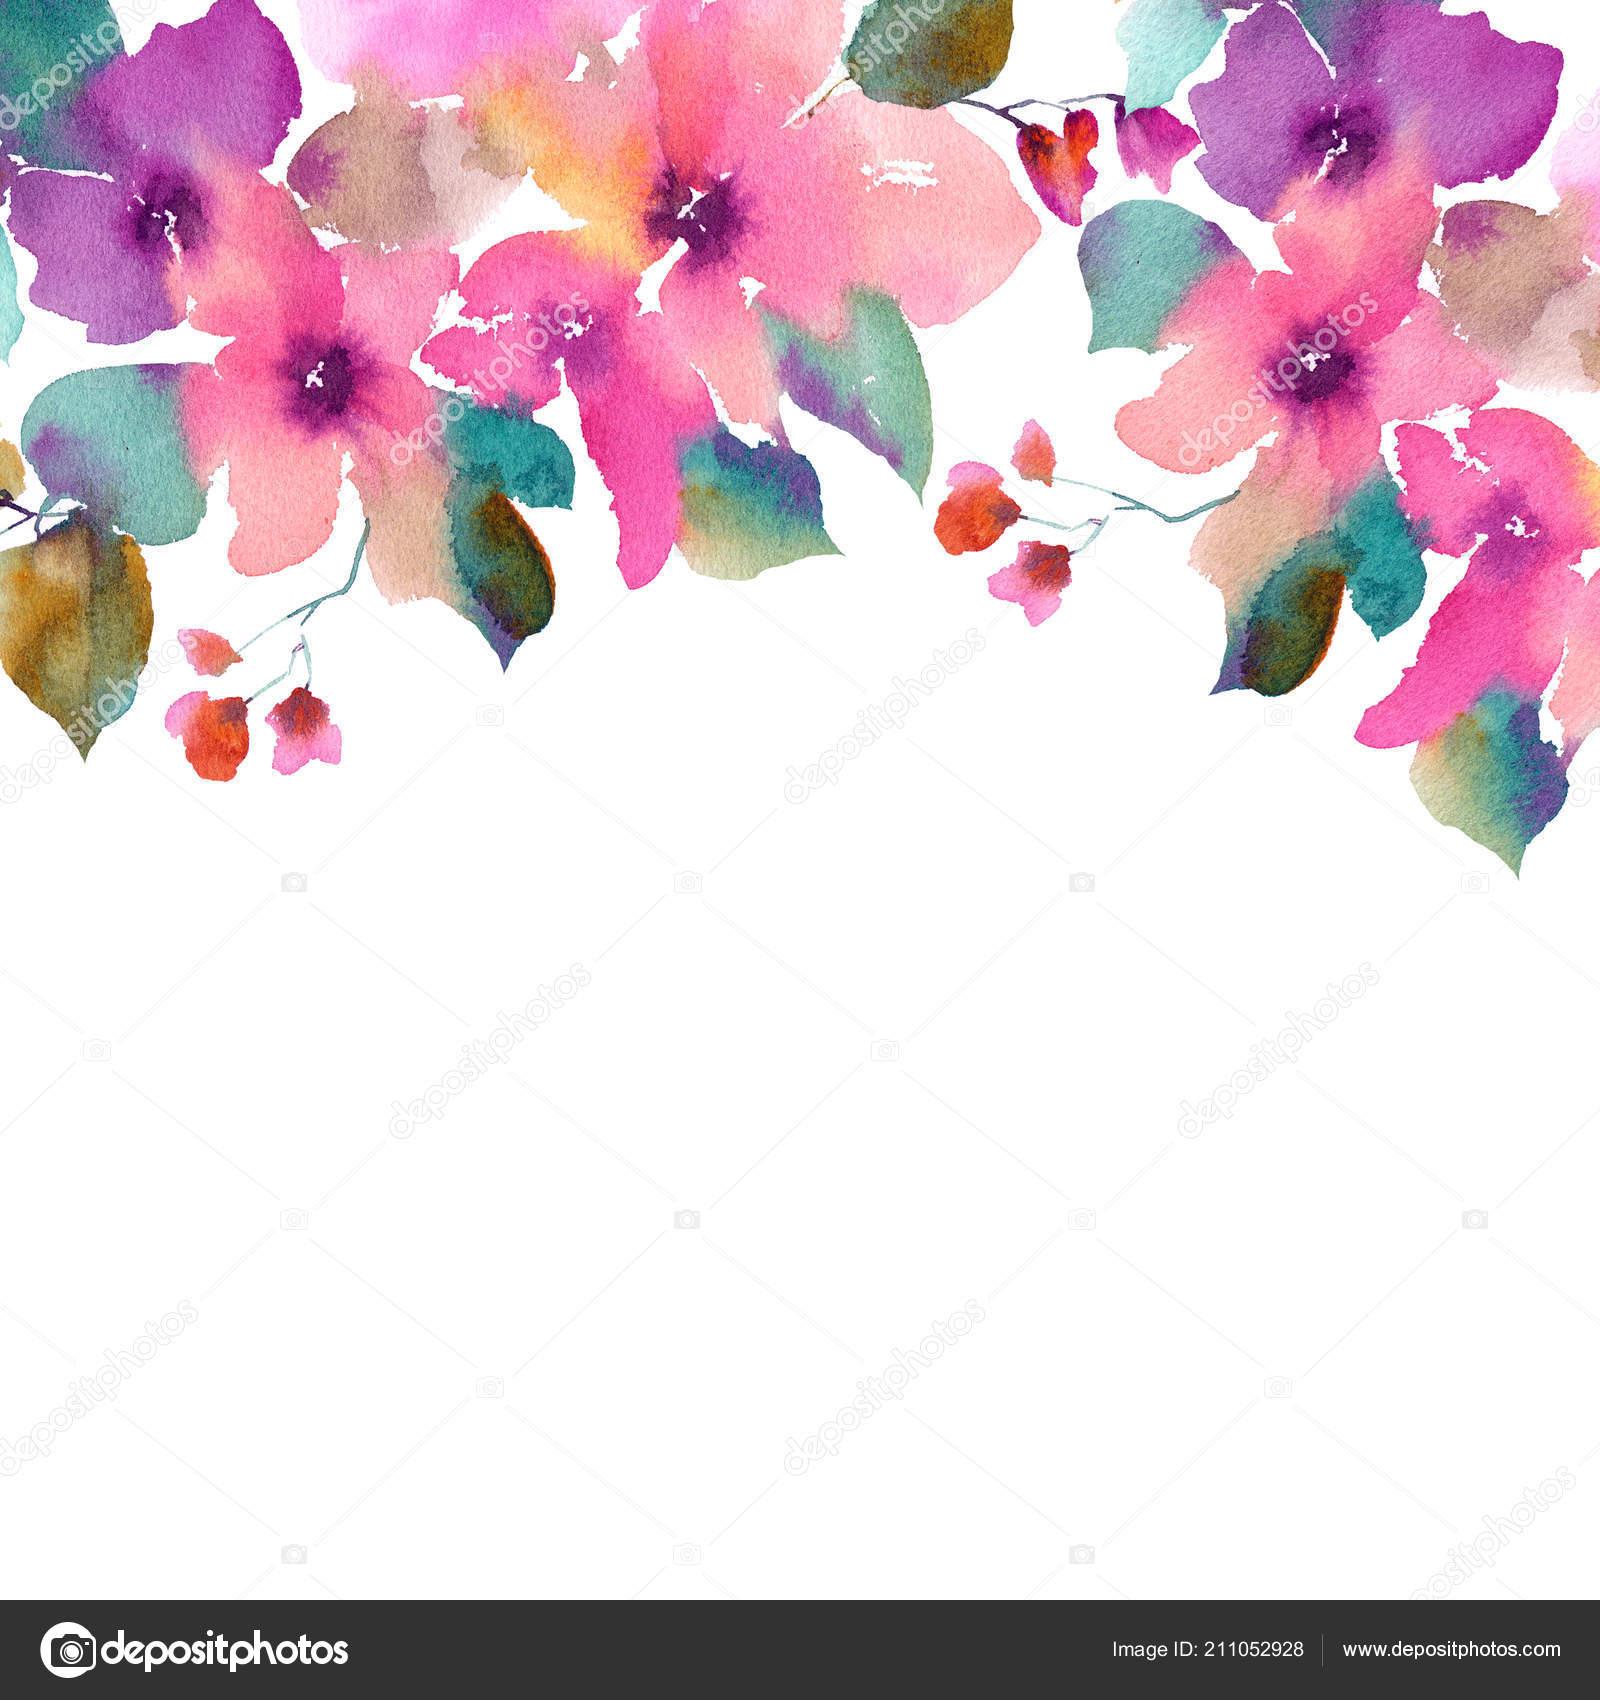 Watercolor Flowers Floral Frame Flowers Border Painting Flowers Pink